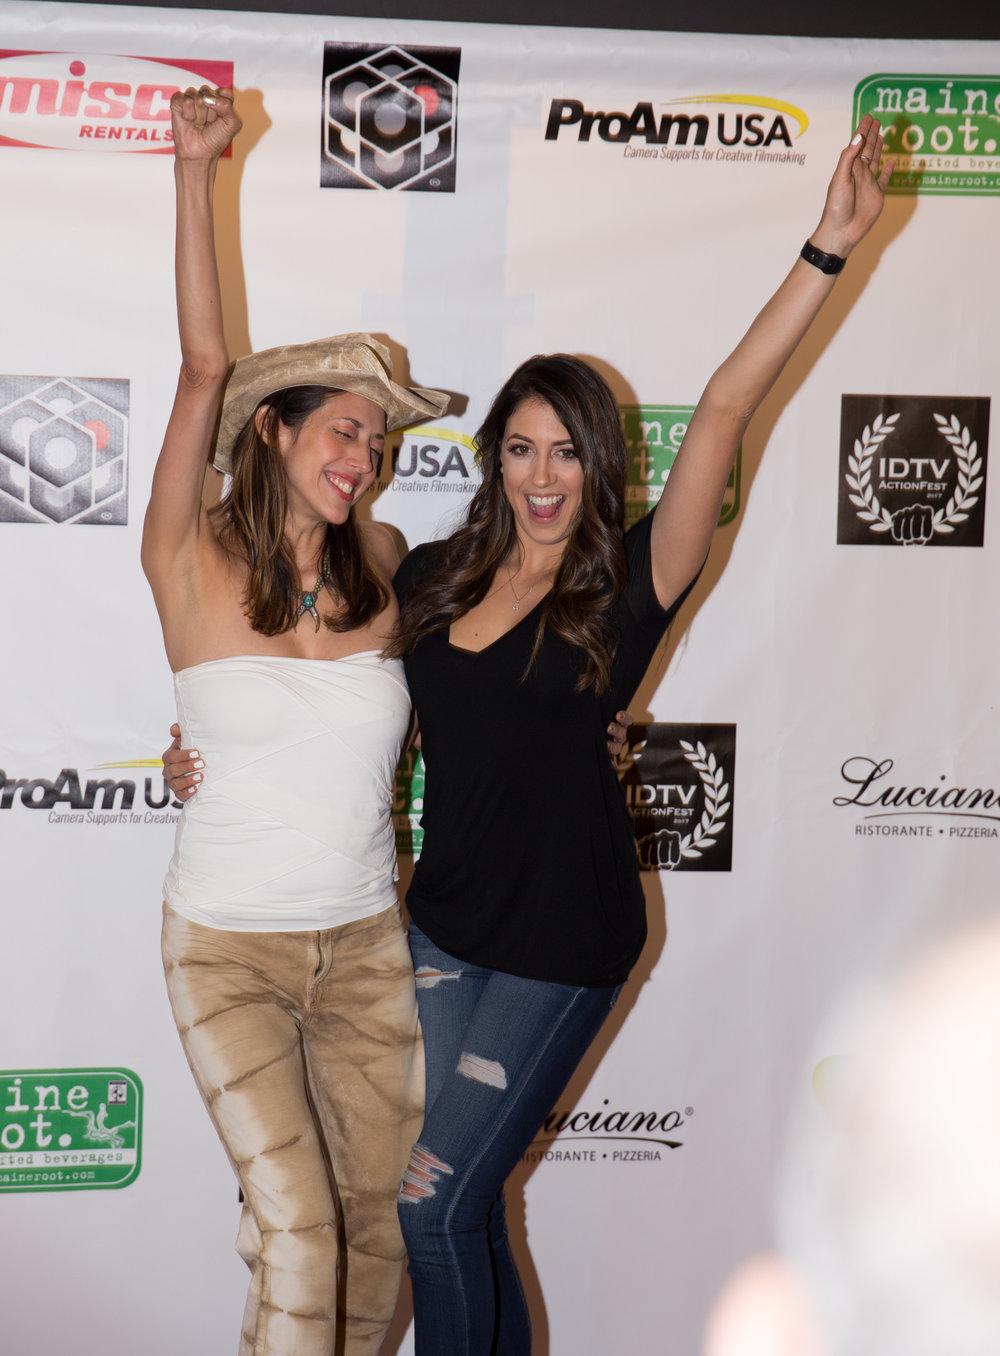 Patricia Vonne and Caitlin Dechelle